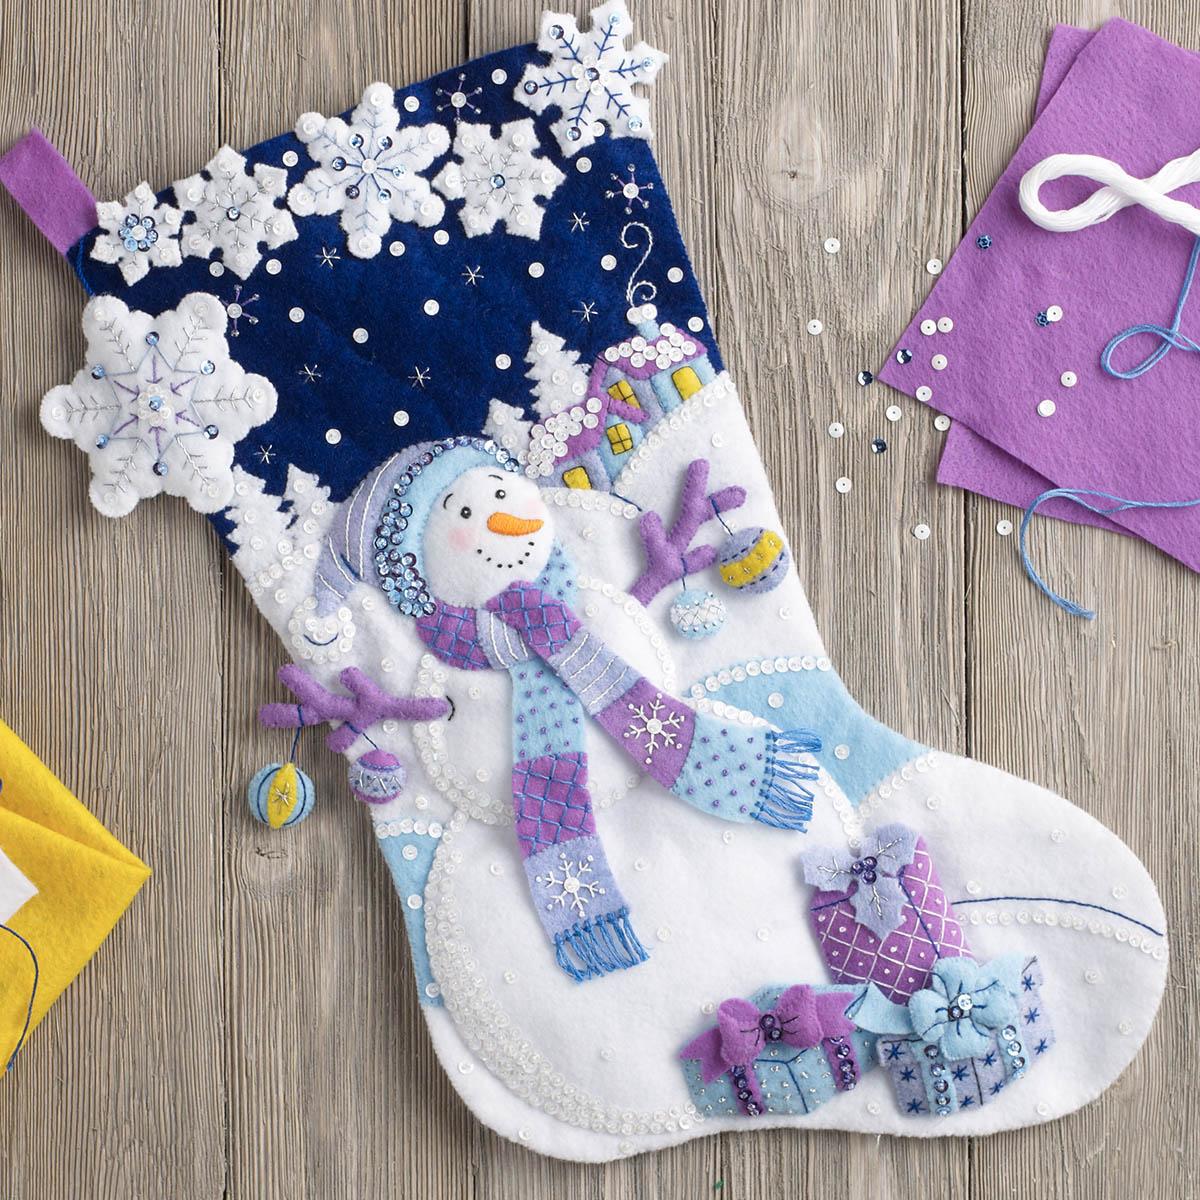 Bucilla ® Seasonal - Felt - Stocking Kits - Frosty Night - 86703